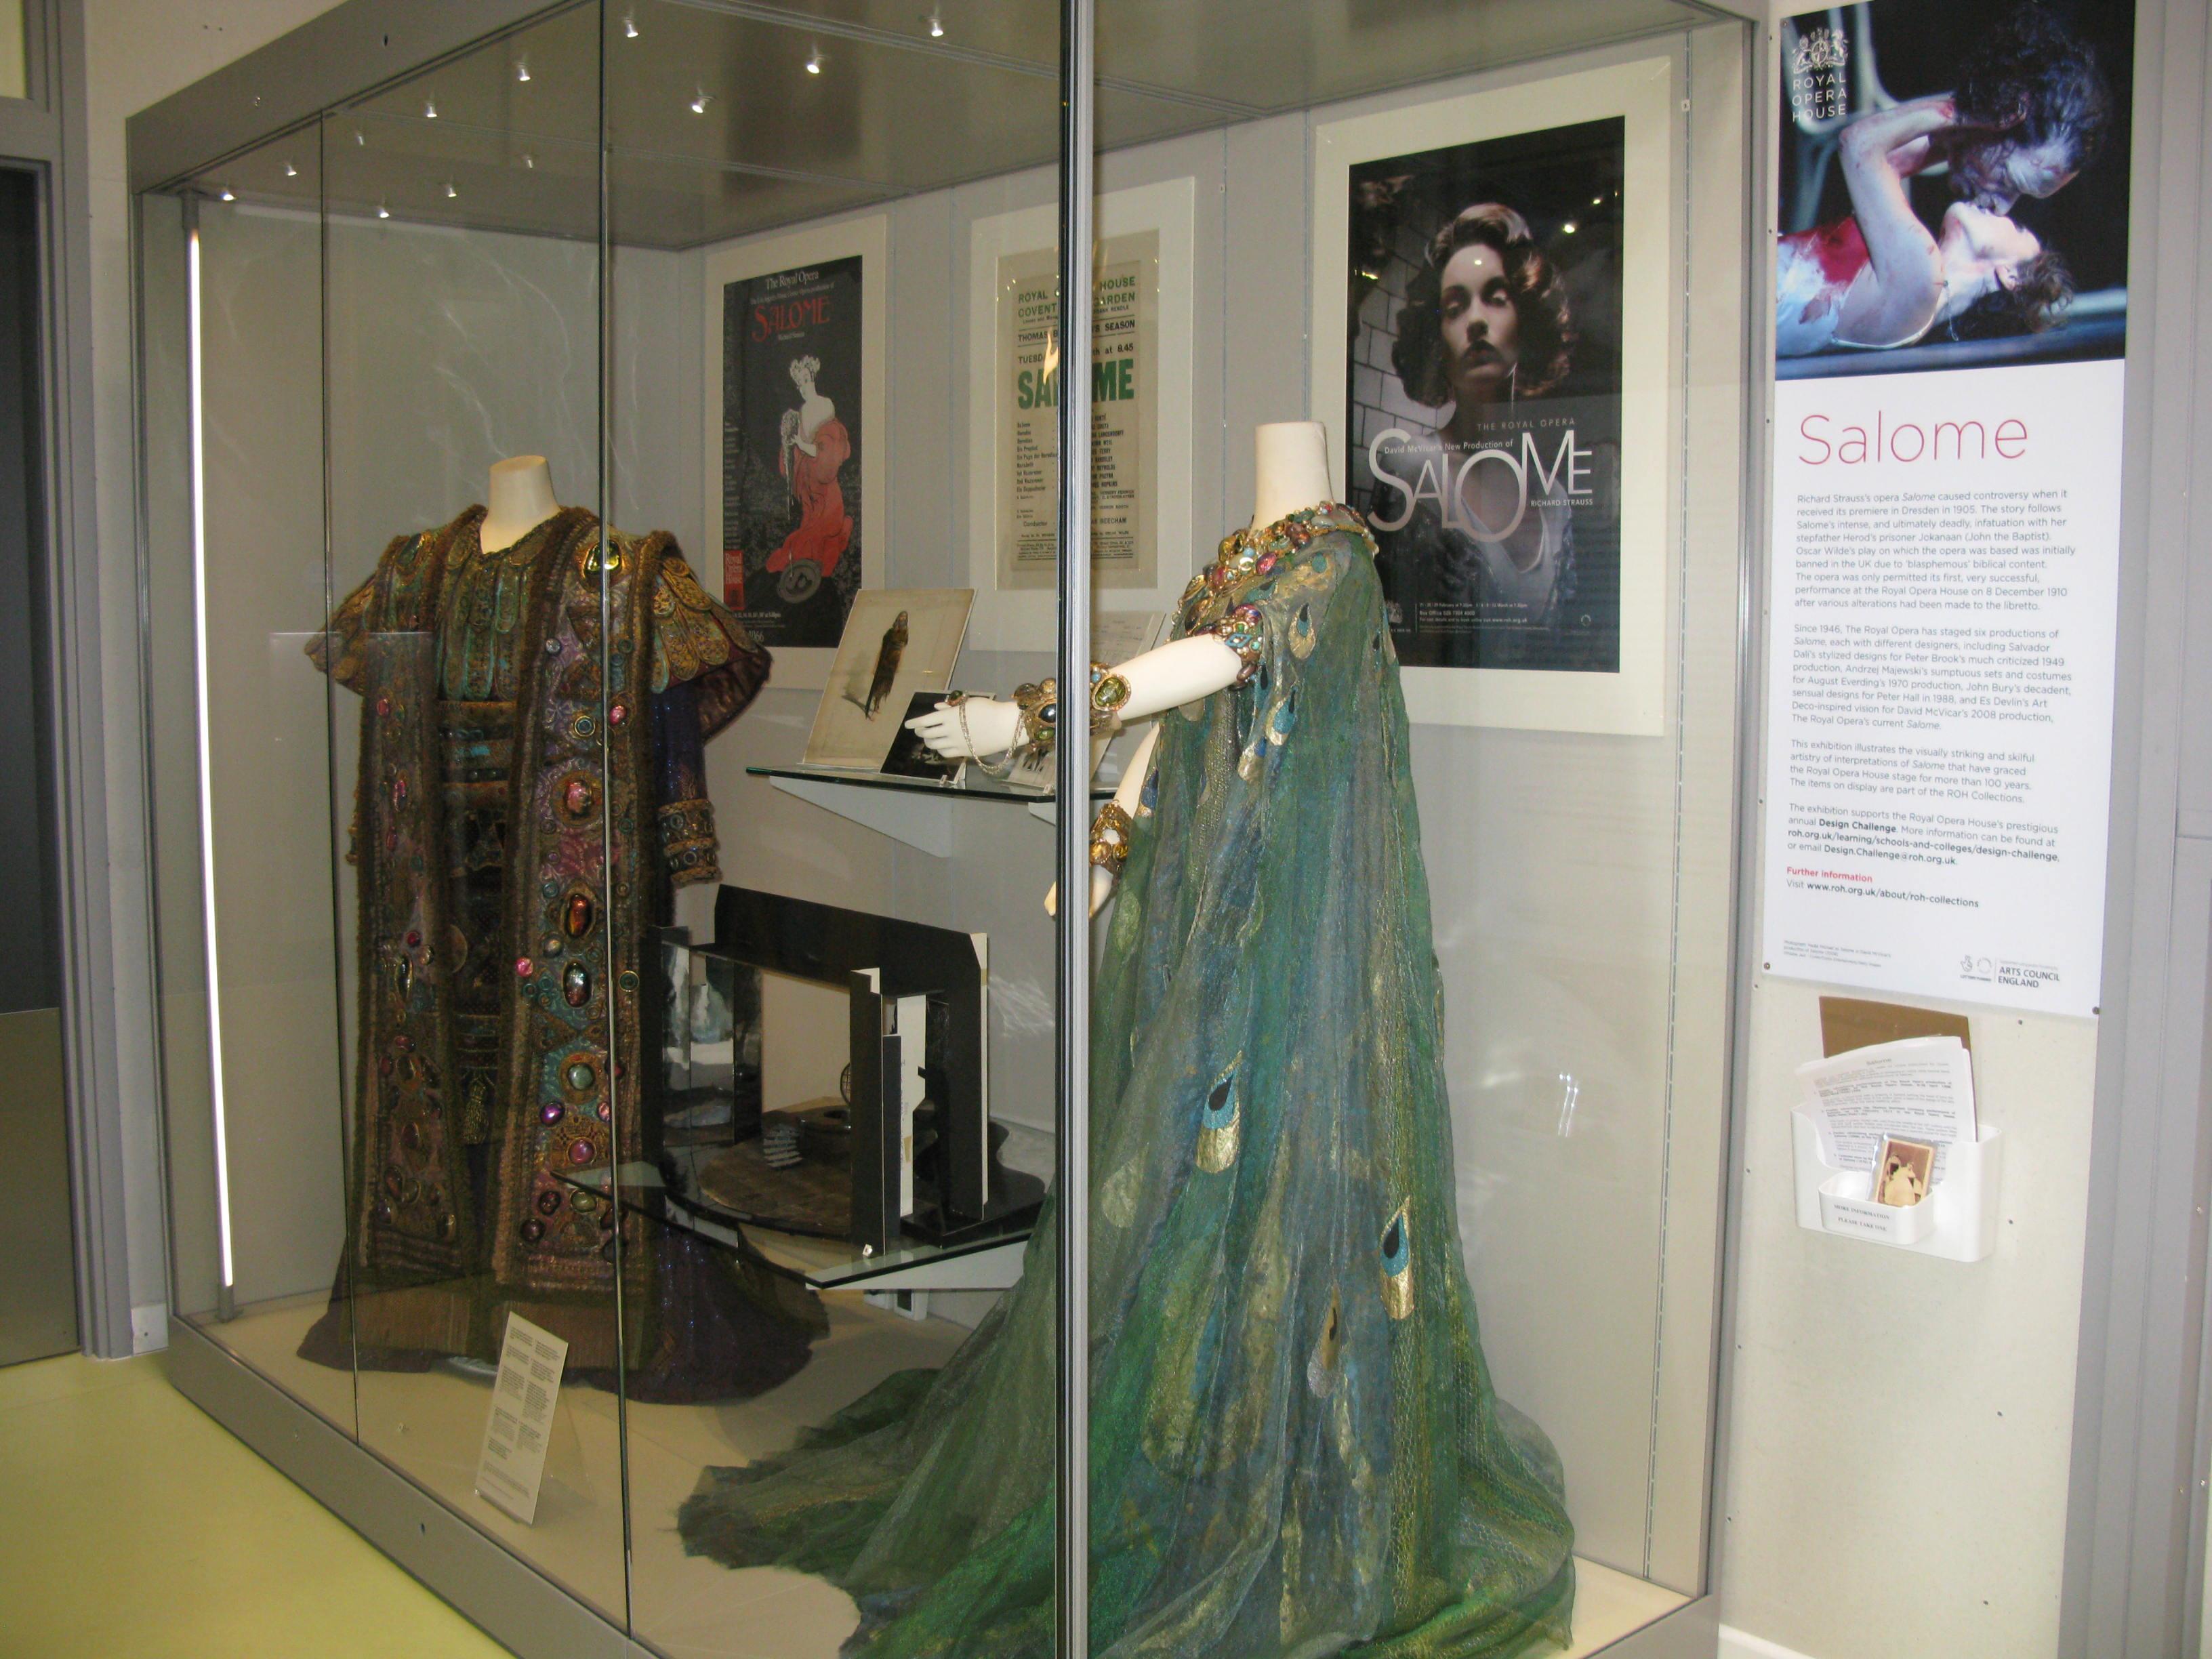 Salome exhibition